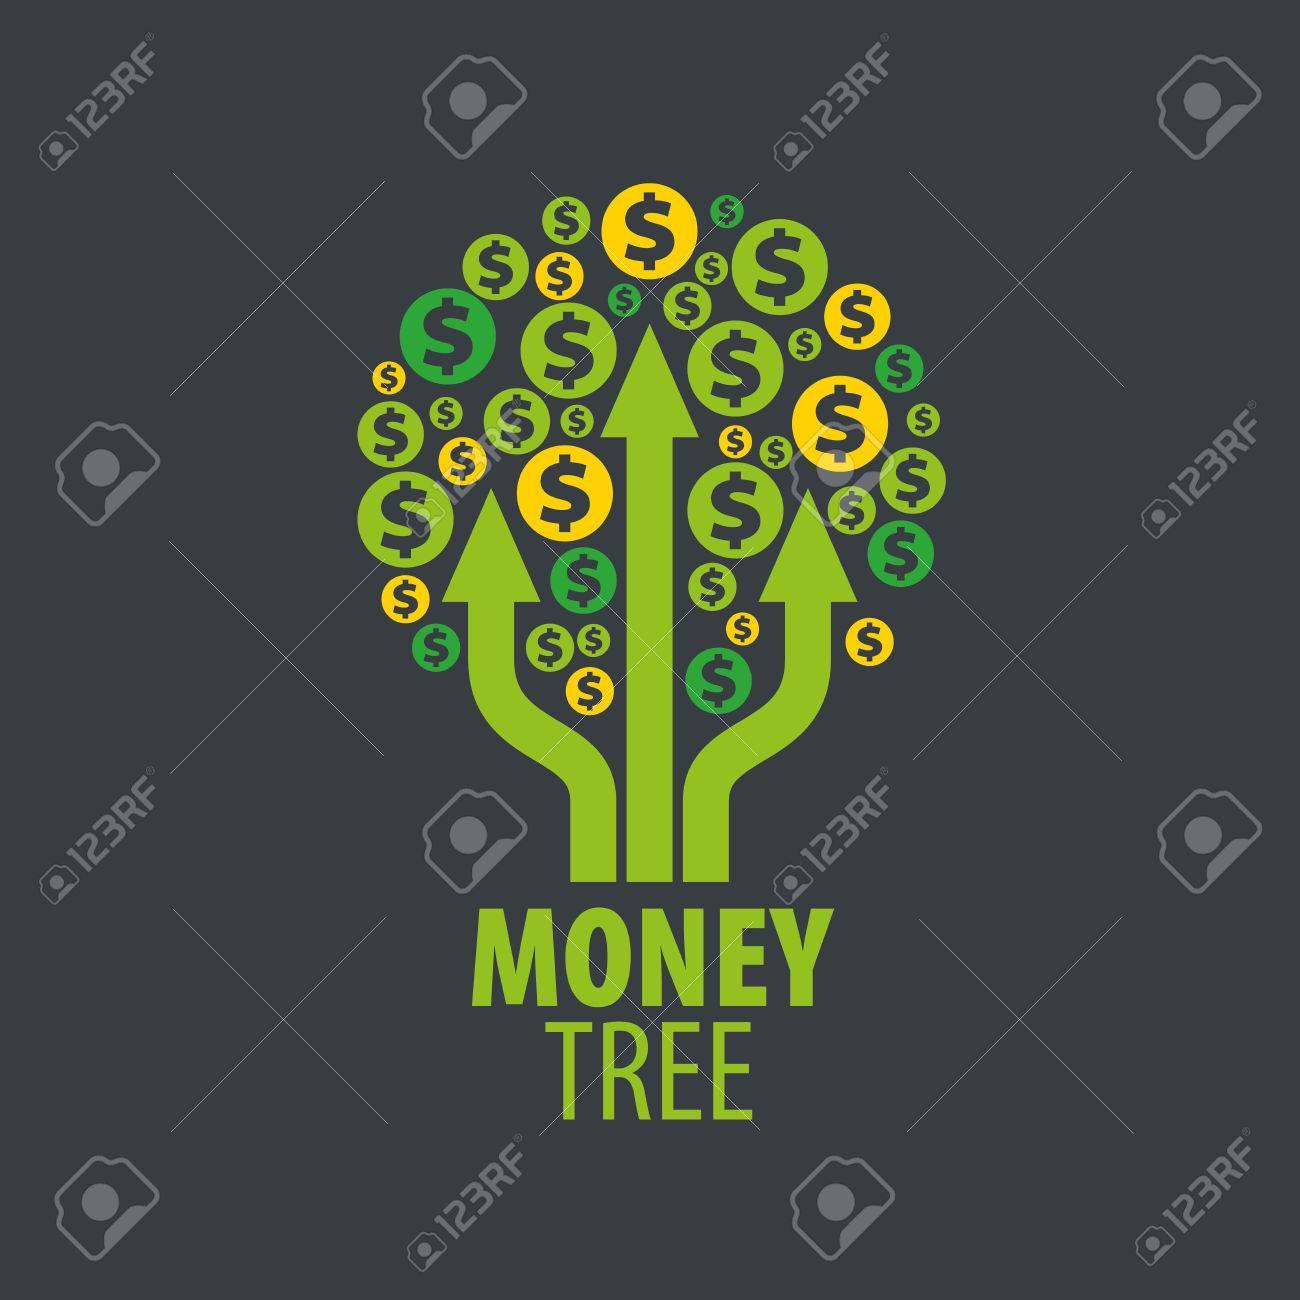 design templates vectors vector artwork waiter resume format 61862745 design template money tree vector illustration stock - Wwwresume Formatcom